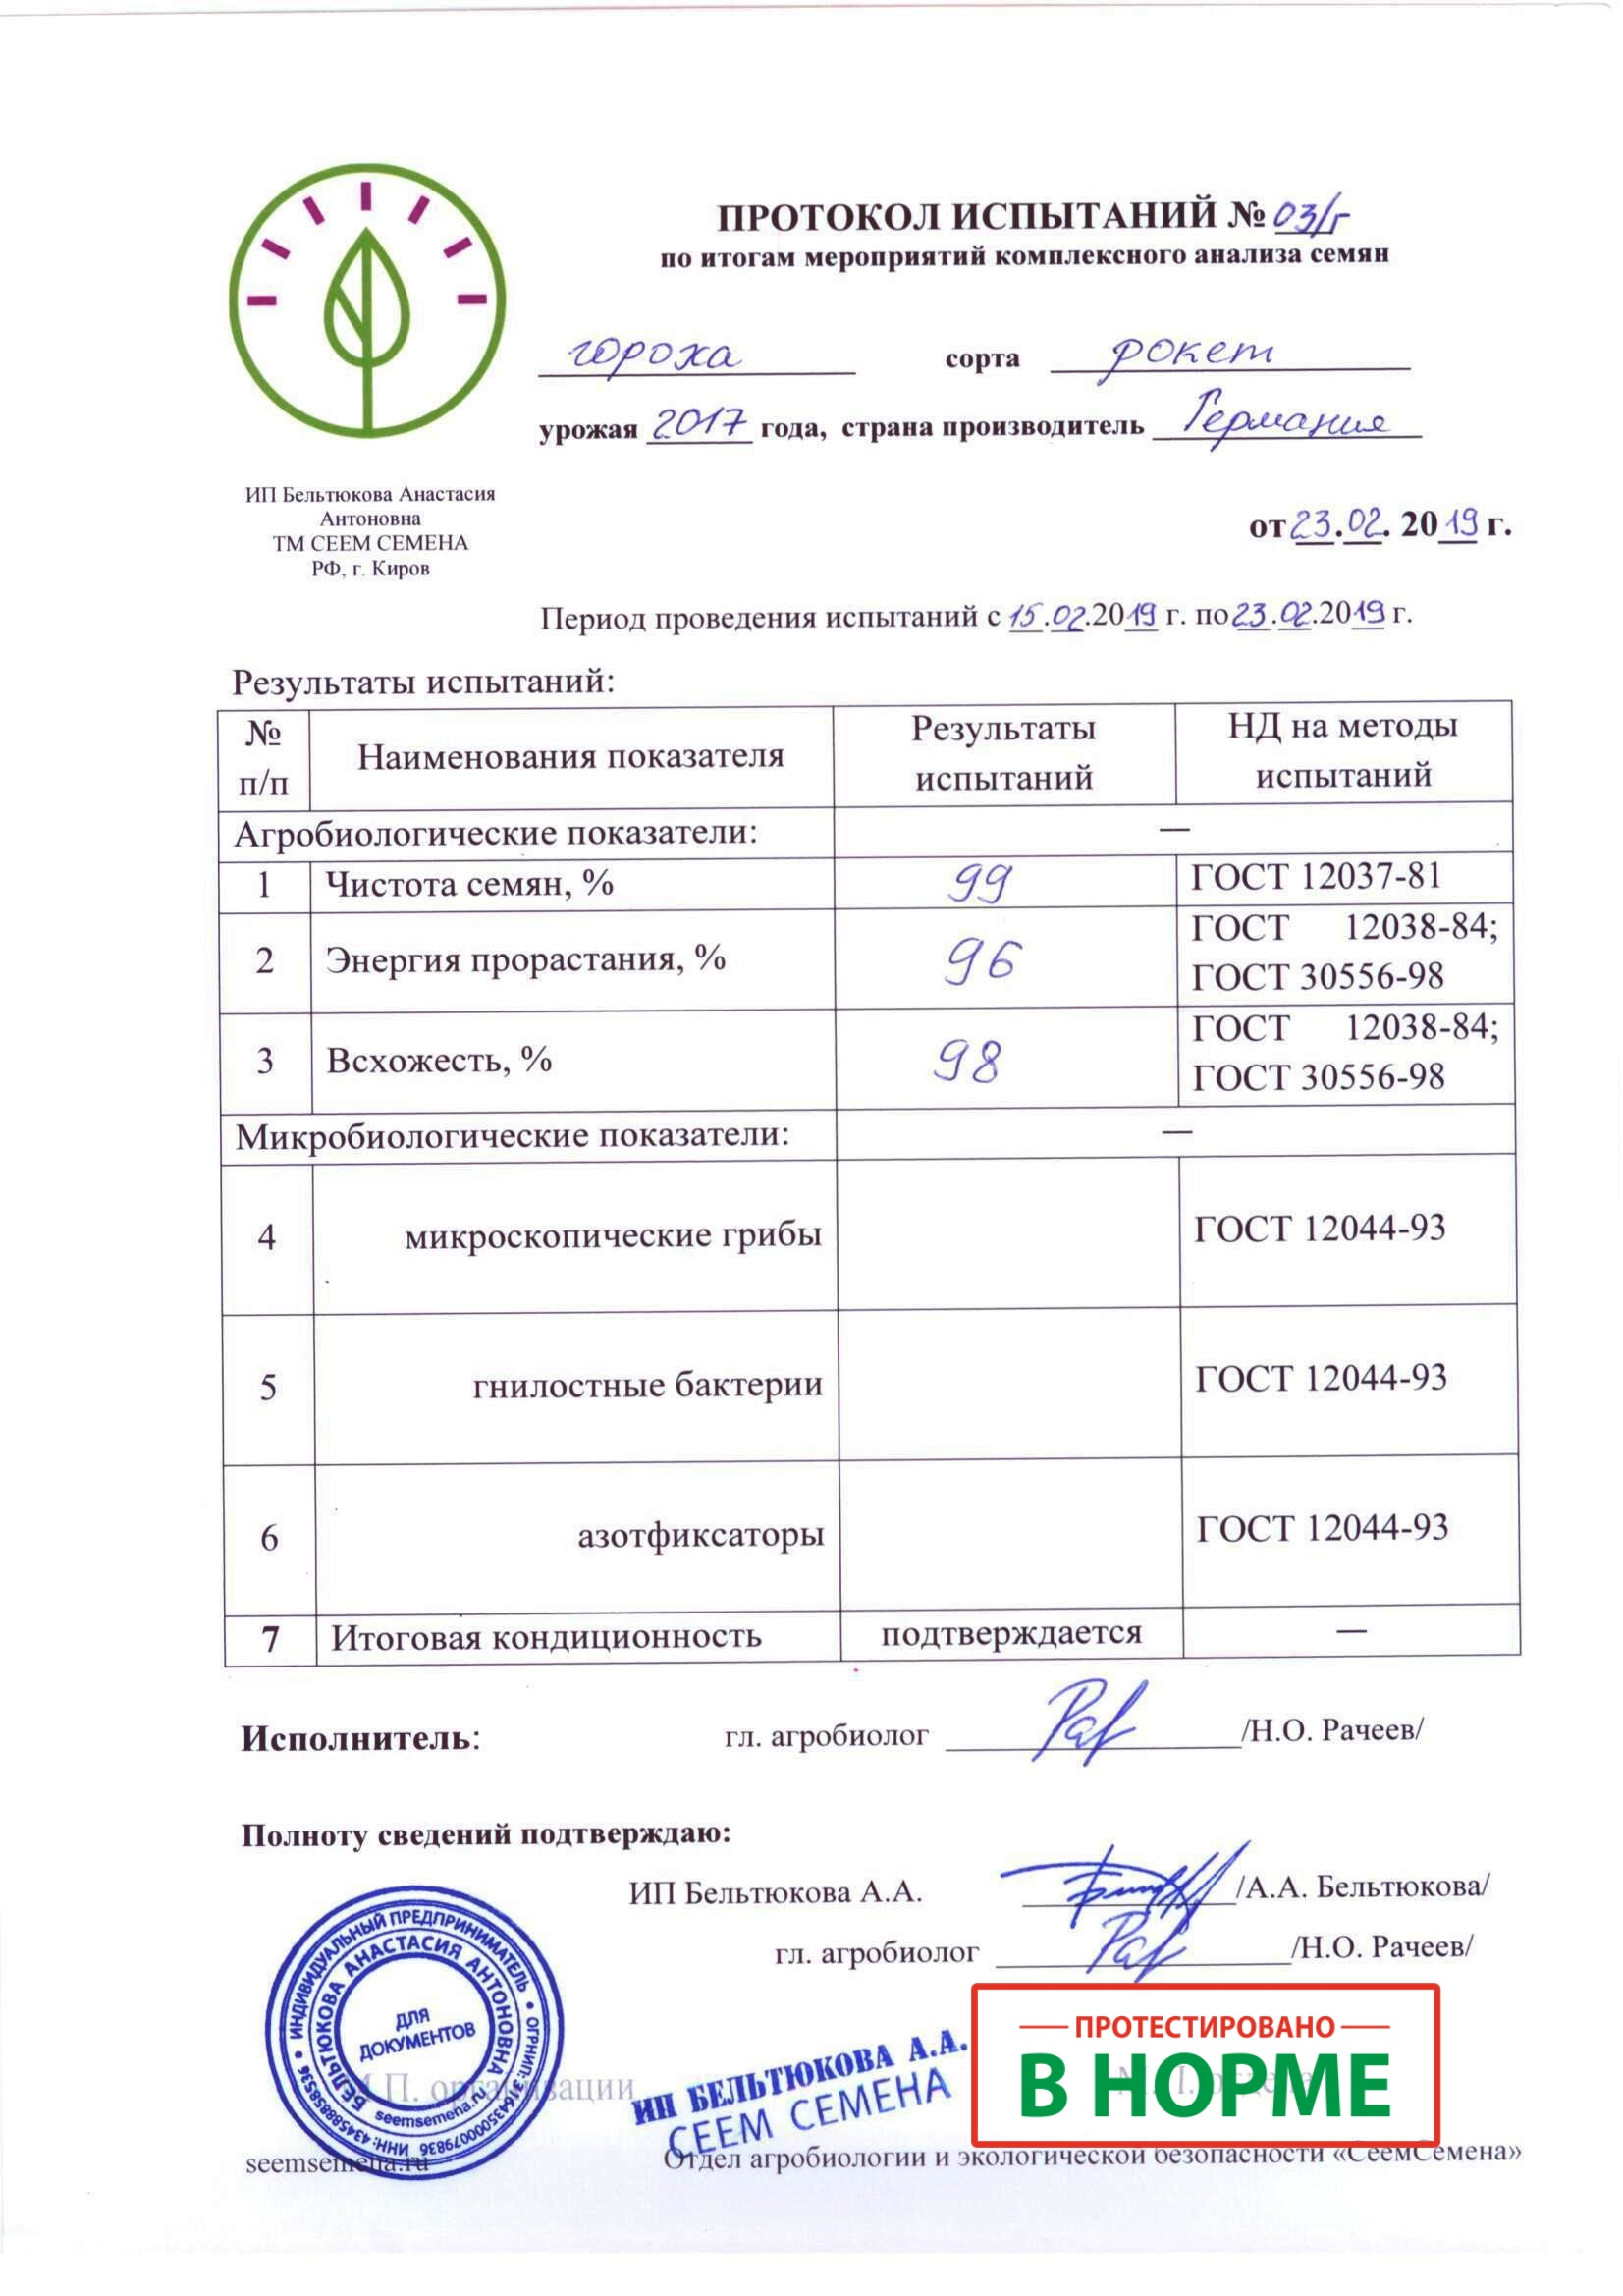 ПРОТОКОЛ ИСПЫТАНИЙ СЕМЯН ГОРОХА №03/г